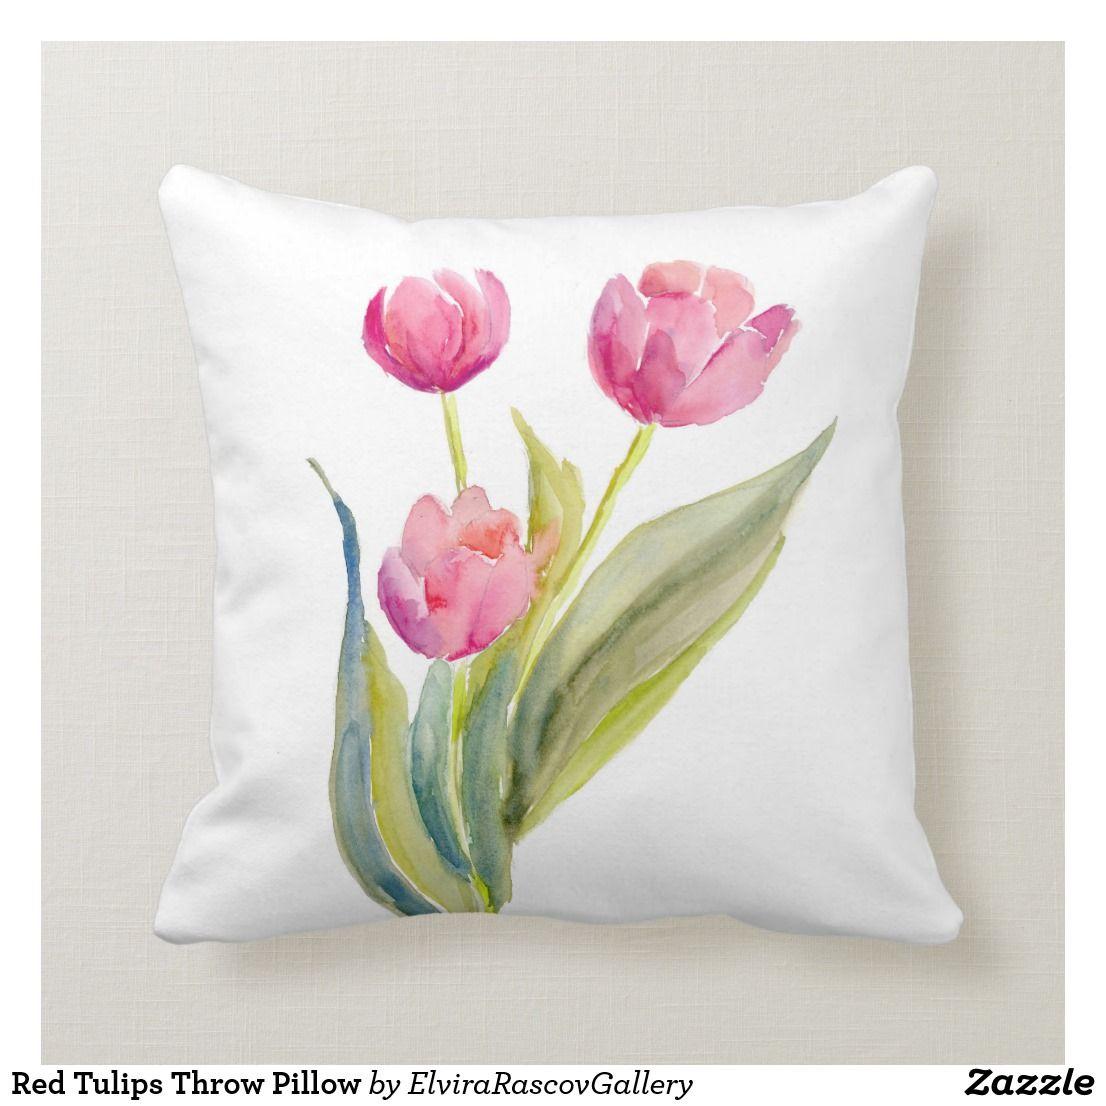 Red Tulips Throw Pillow Zazzle Com In 2020 Tulip Decor Throw Pillows Flower Throw Pillows